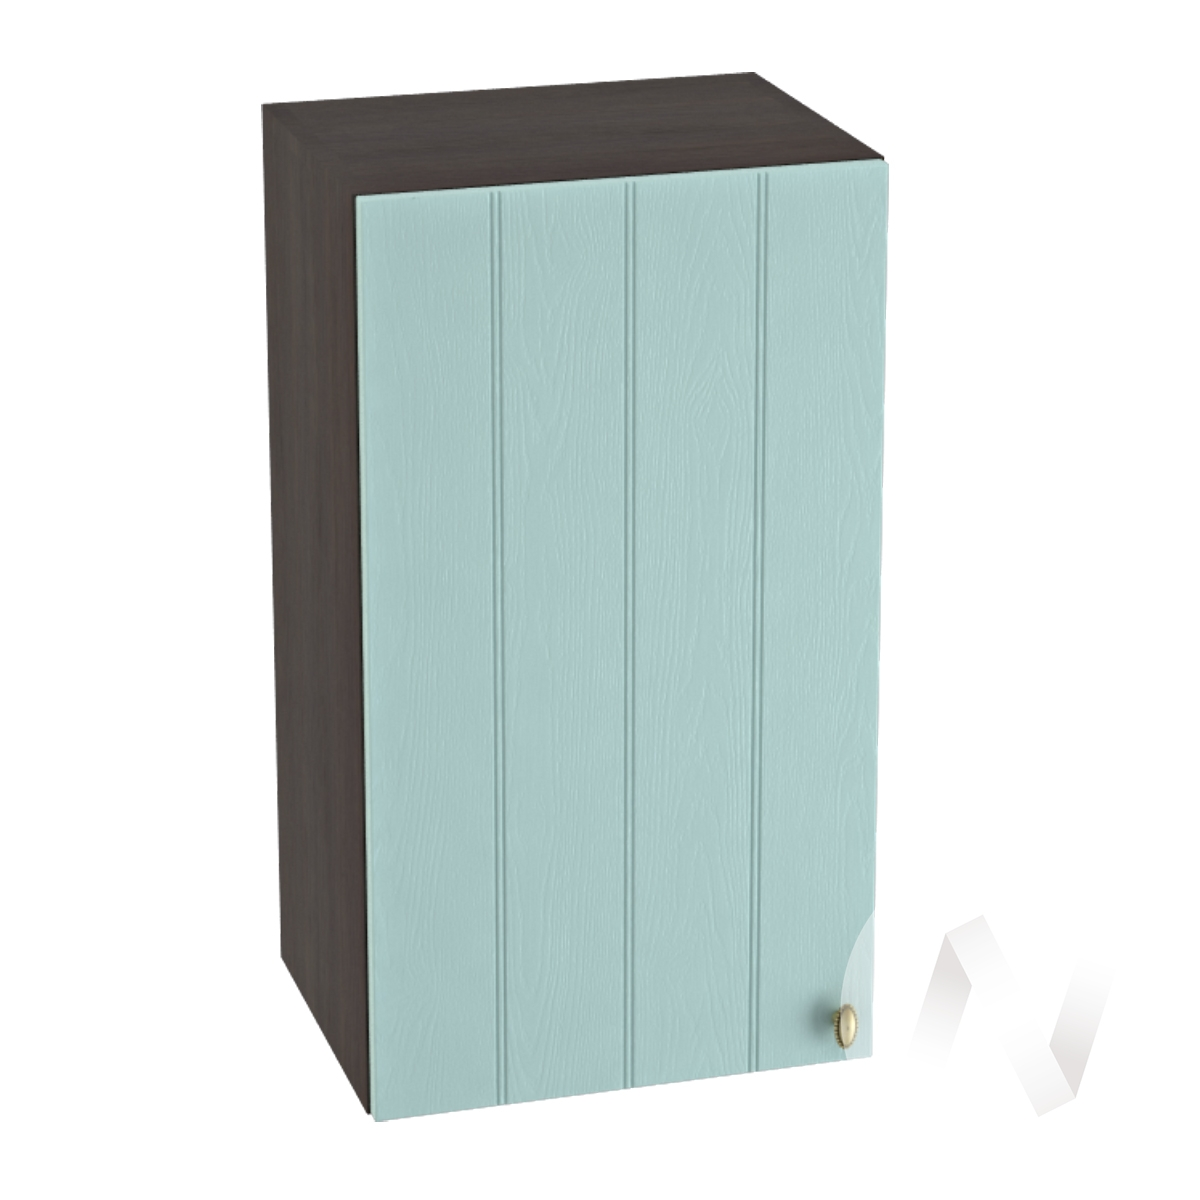 "Кухня ""Прованс"": Шкаф верхний 400, ШВ 400 (голубой/корпус венге)"